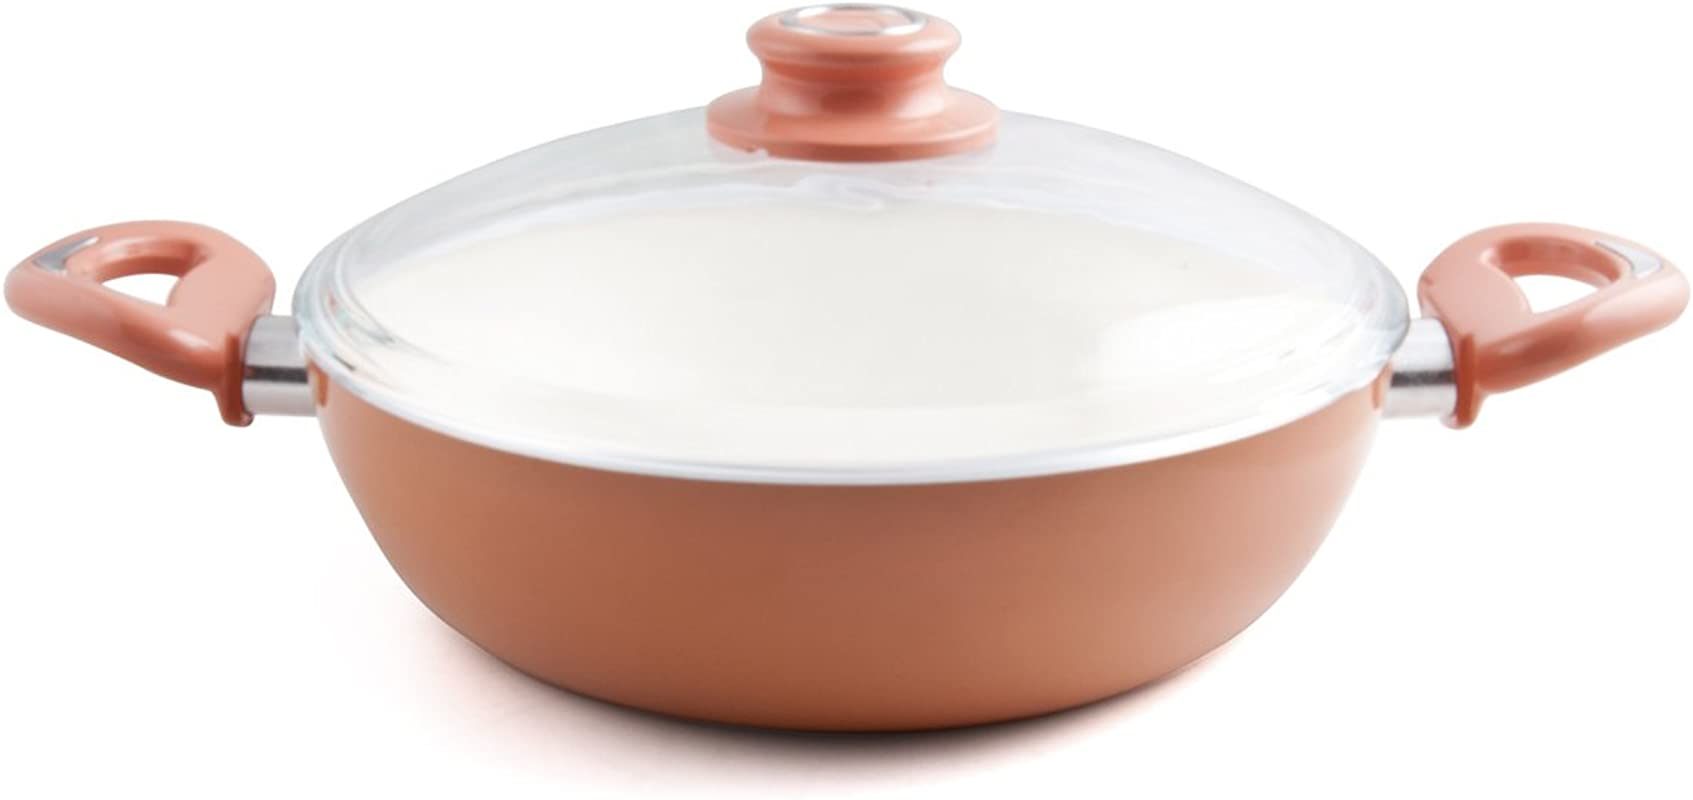 Essenso Ecotouch Lazio Enamel Coated Low Dutch Oven With Nonstick Ceramic Interior PTFE PFOA Free 3 Quart Orange